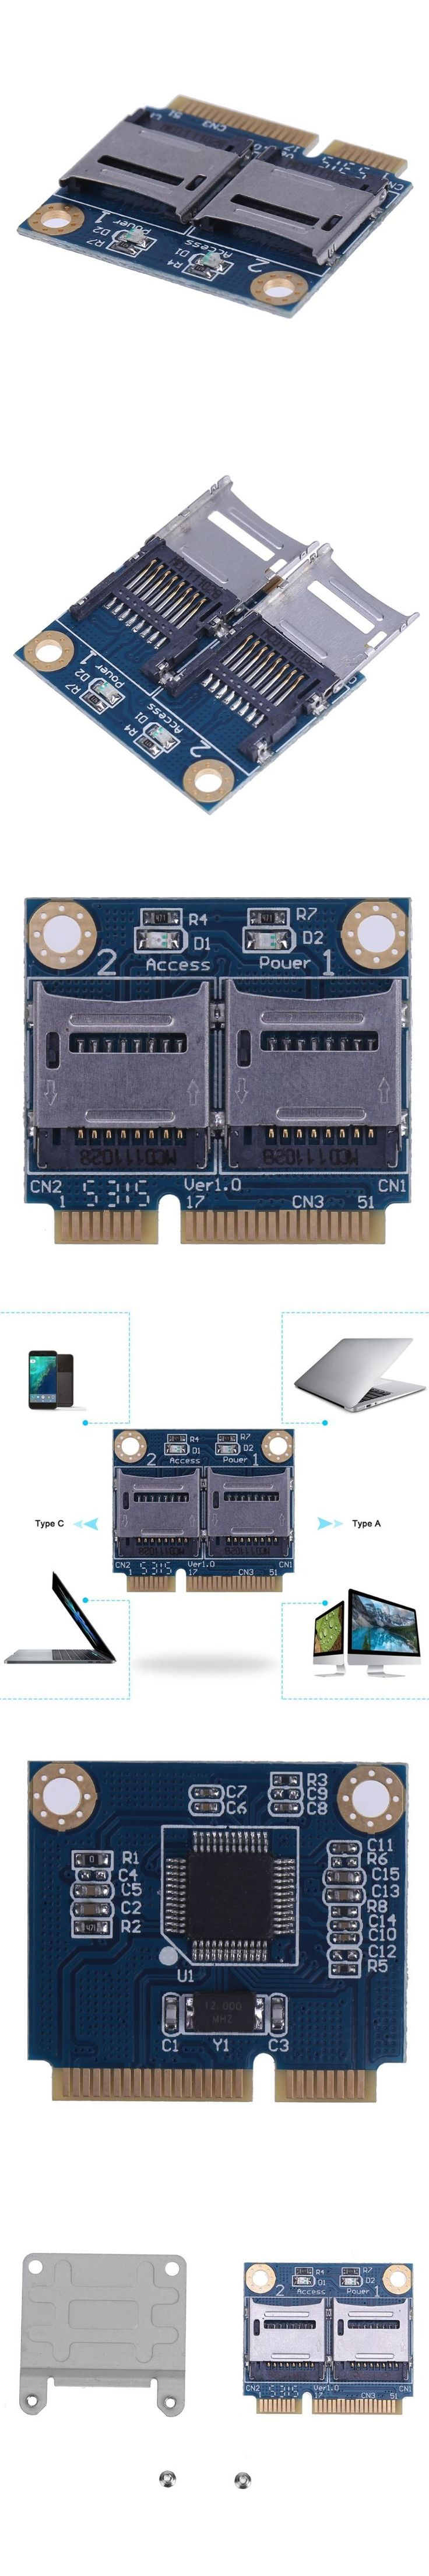 Mini PCI-E Memory Card Adapter PCI-E to Dual TF SDHC SDXC Reader Converter for Micro SD Card High Quality